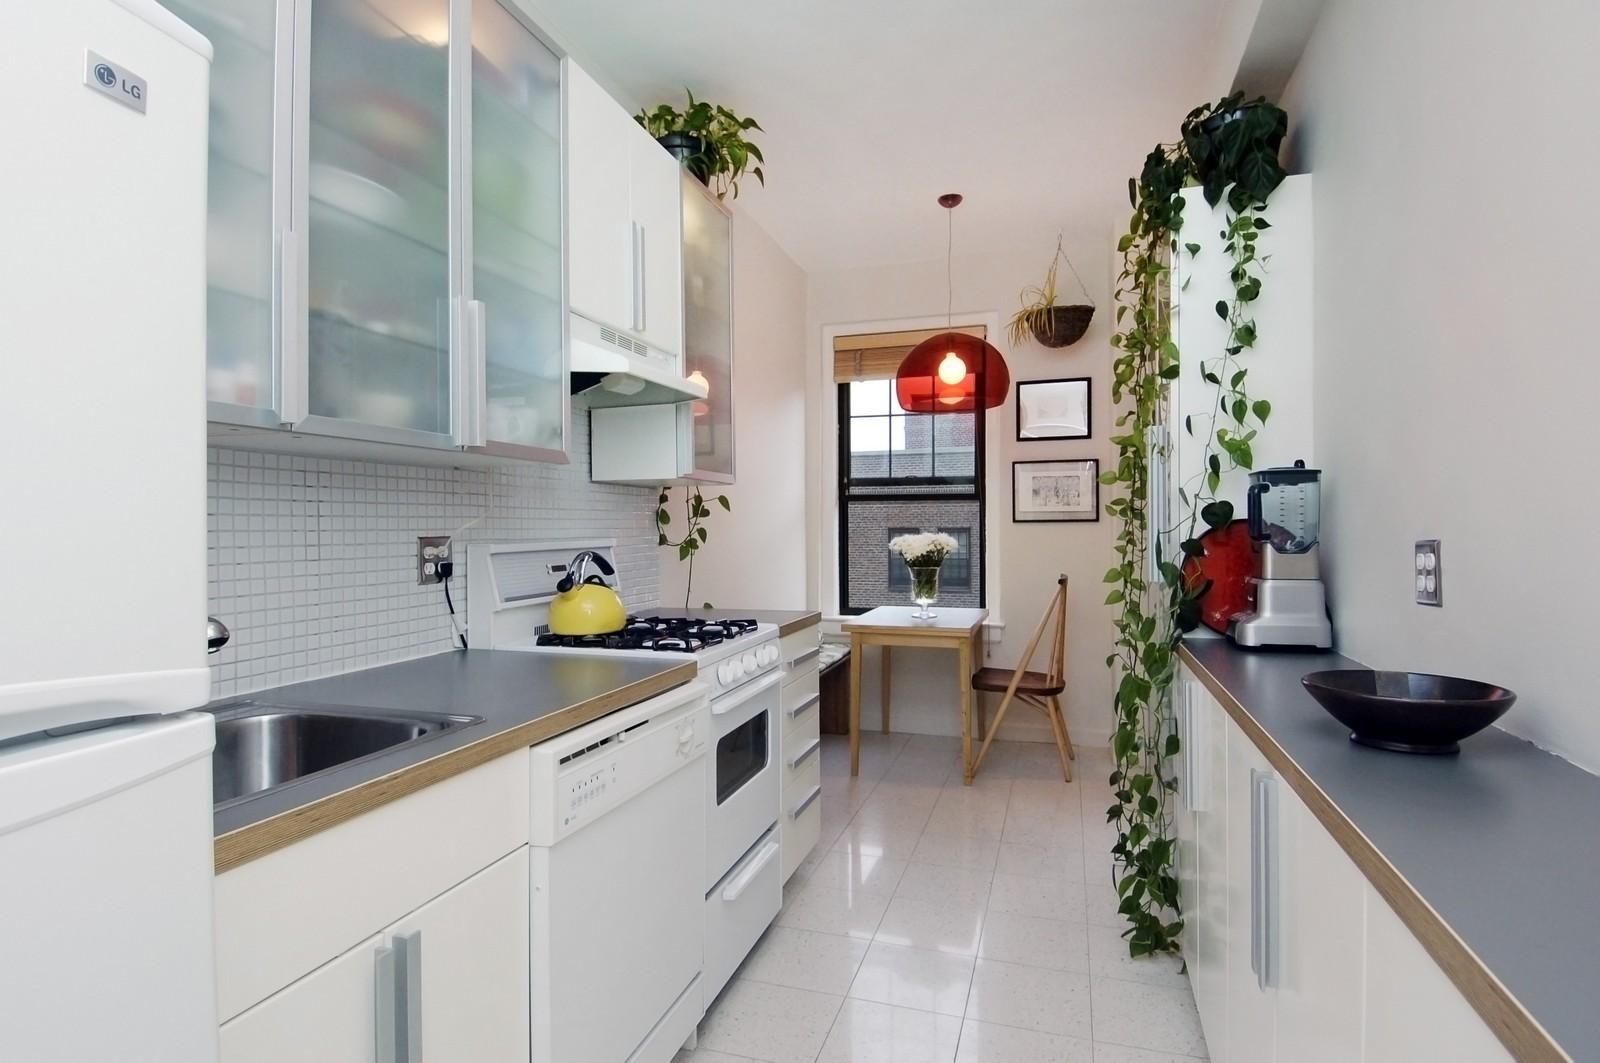 Real Estate Photography - 141 E 3, Apt 4G, New York, NY, 10009 - Kitchen